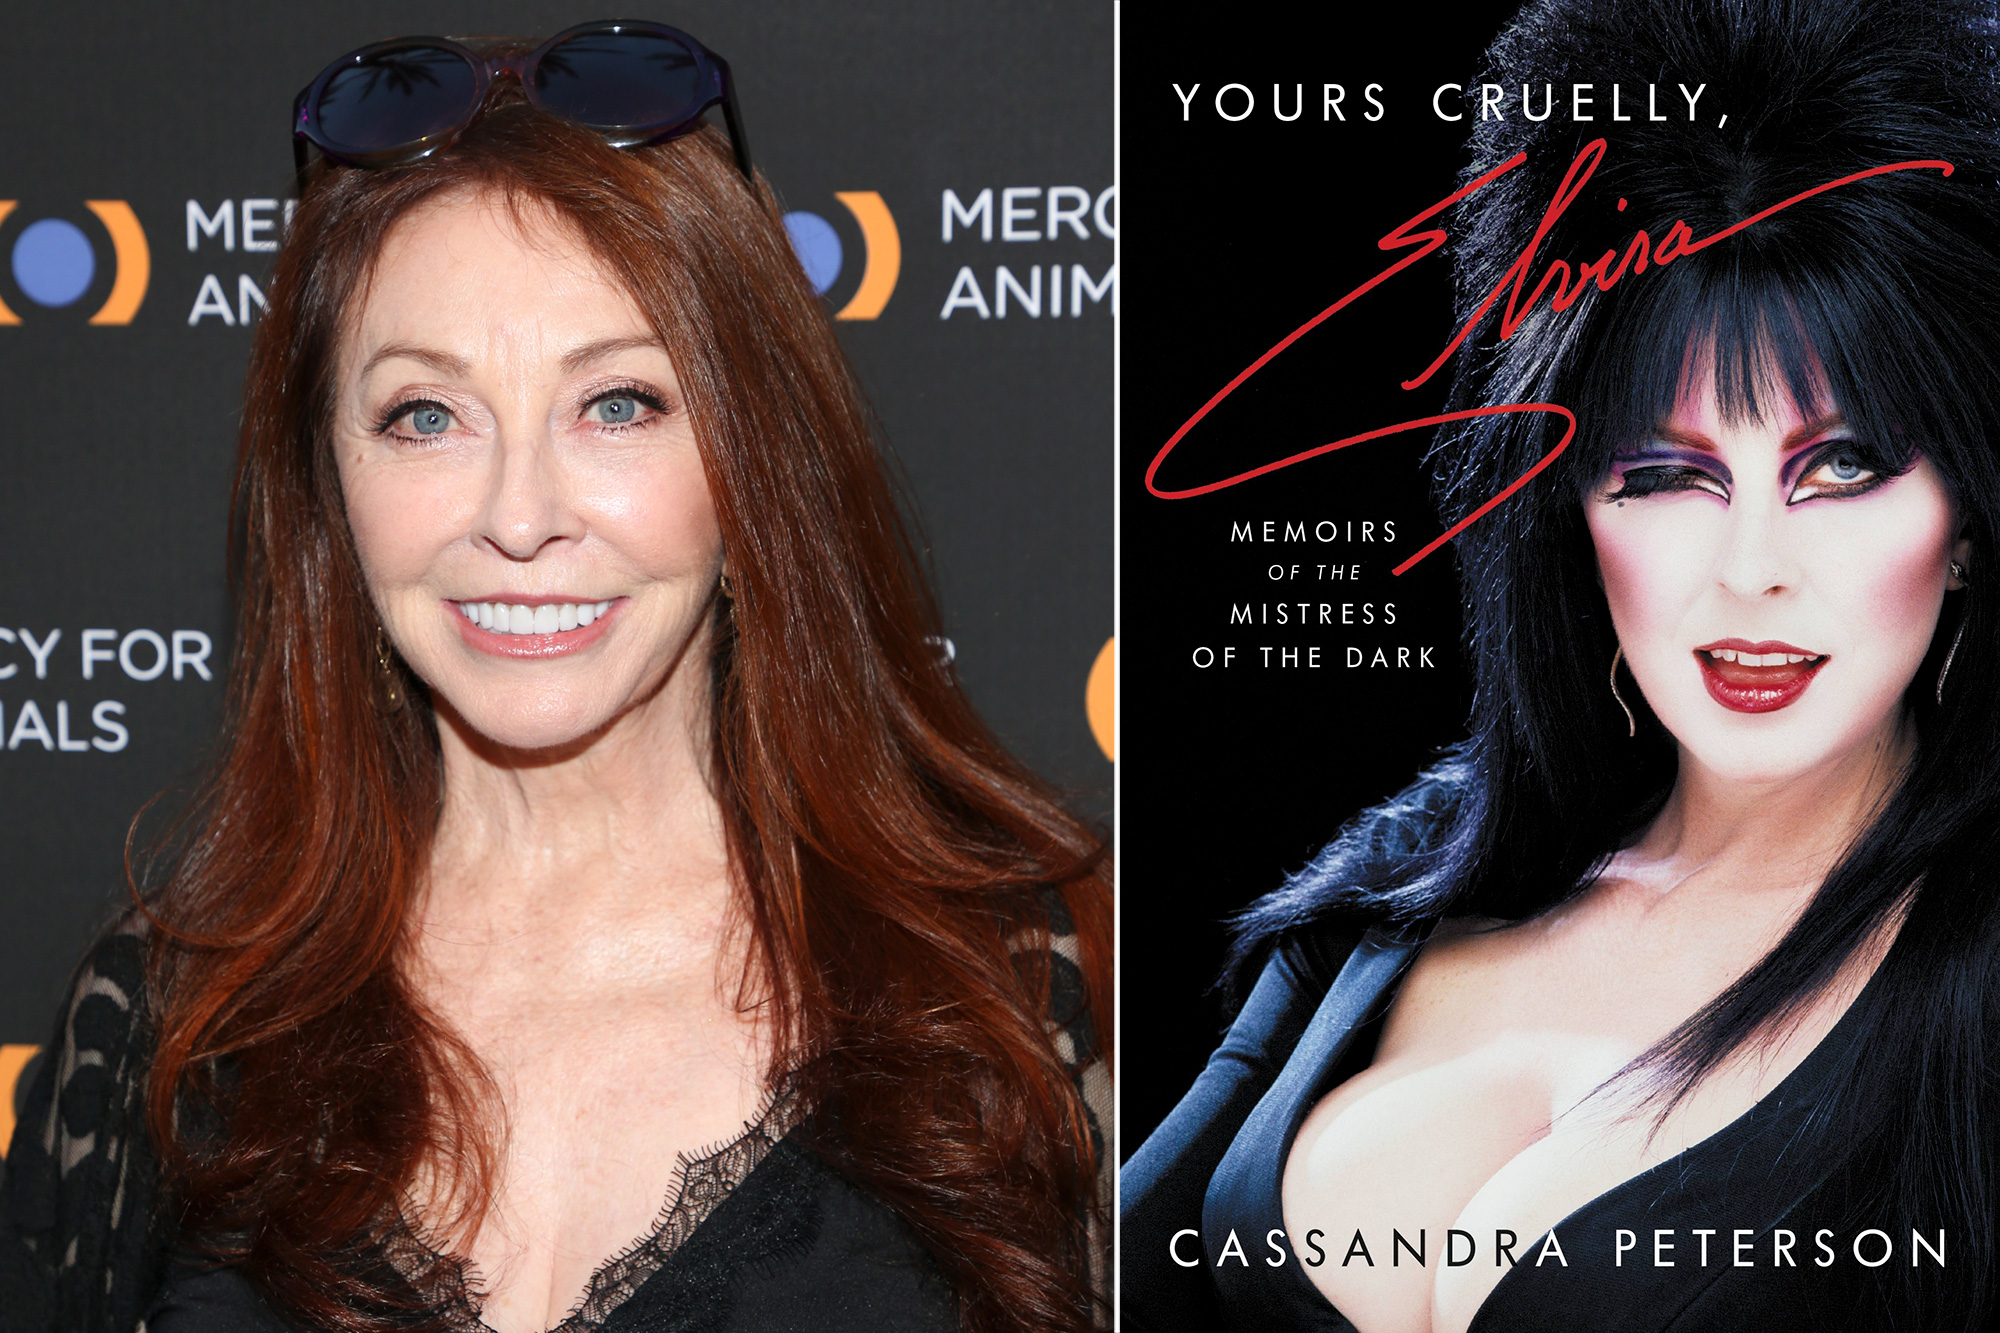 Cassandra Peterson, Yours Cruelly, Elvira: Memoirs of the Mistress of the Dark